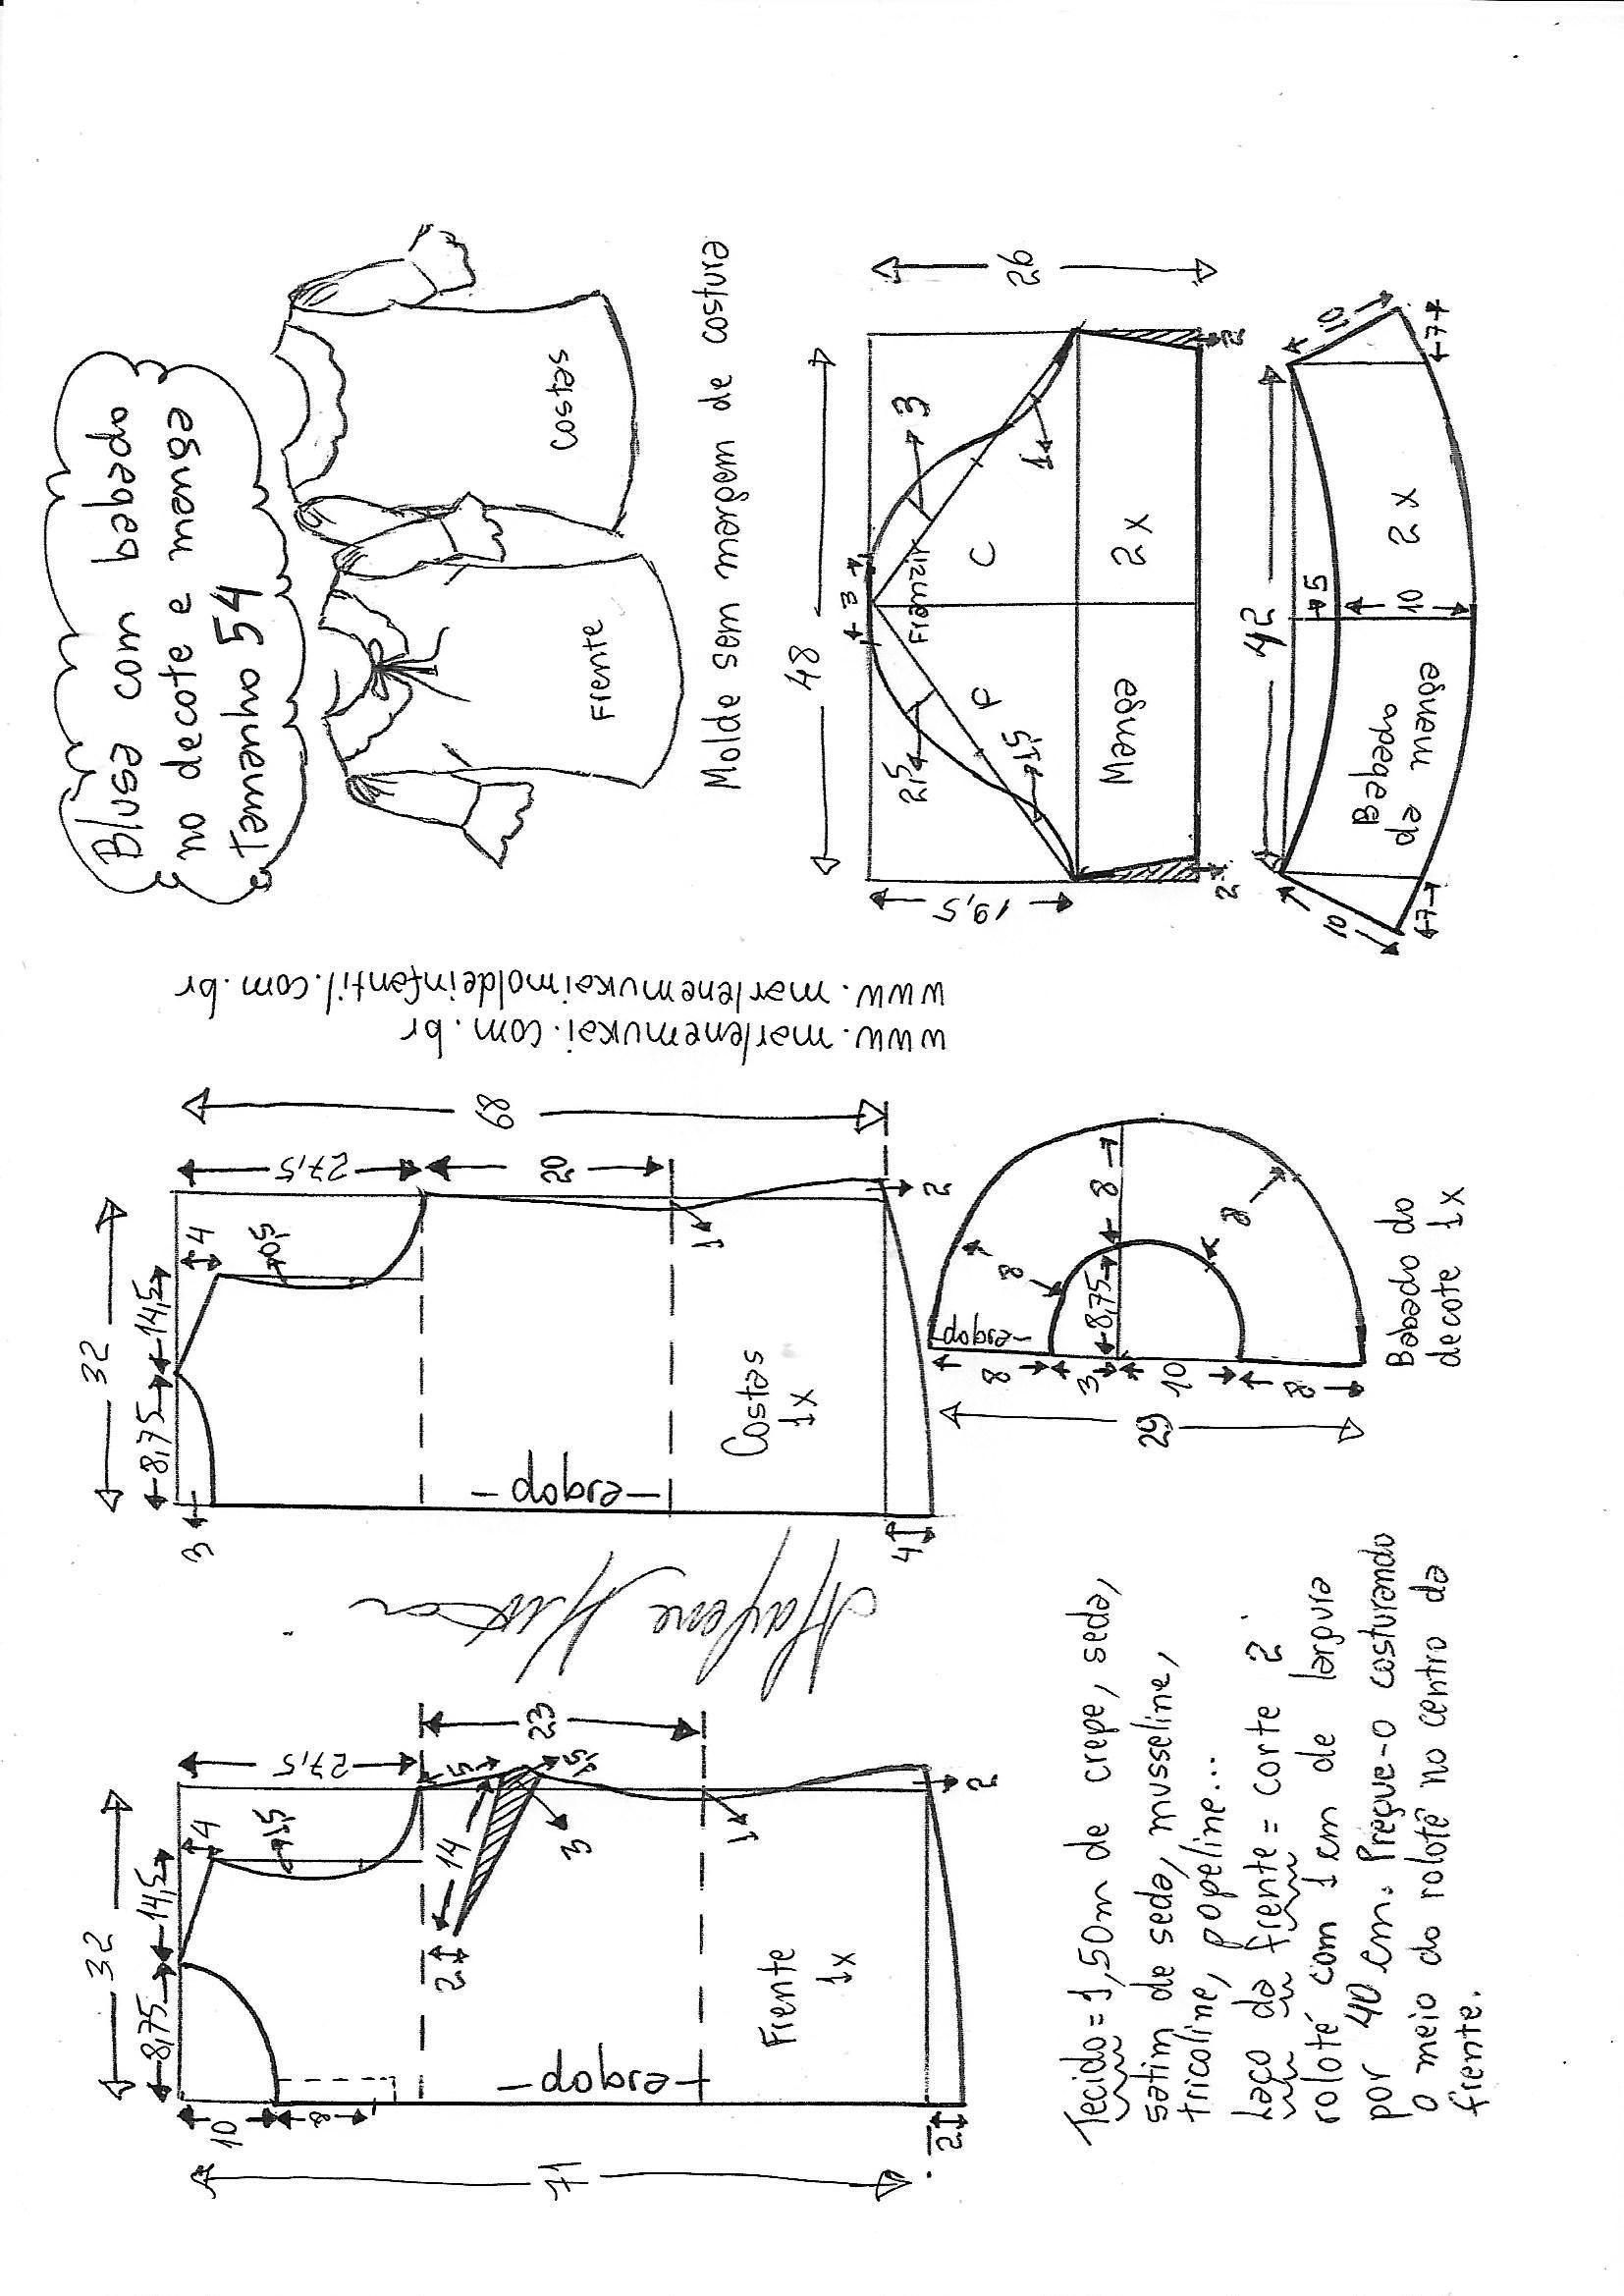 Pin de Aylen en Patrones de costura | Pinterest | Blusas, Trucos ...